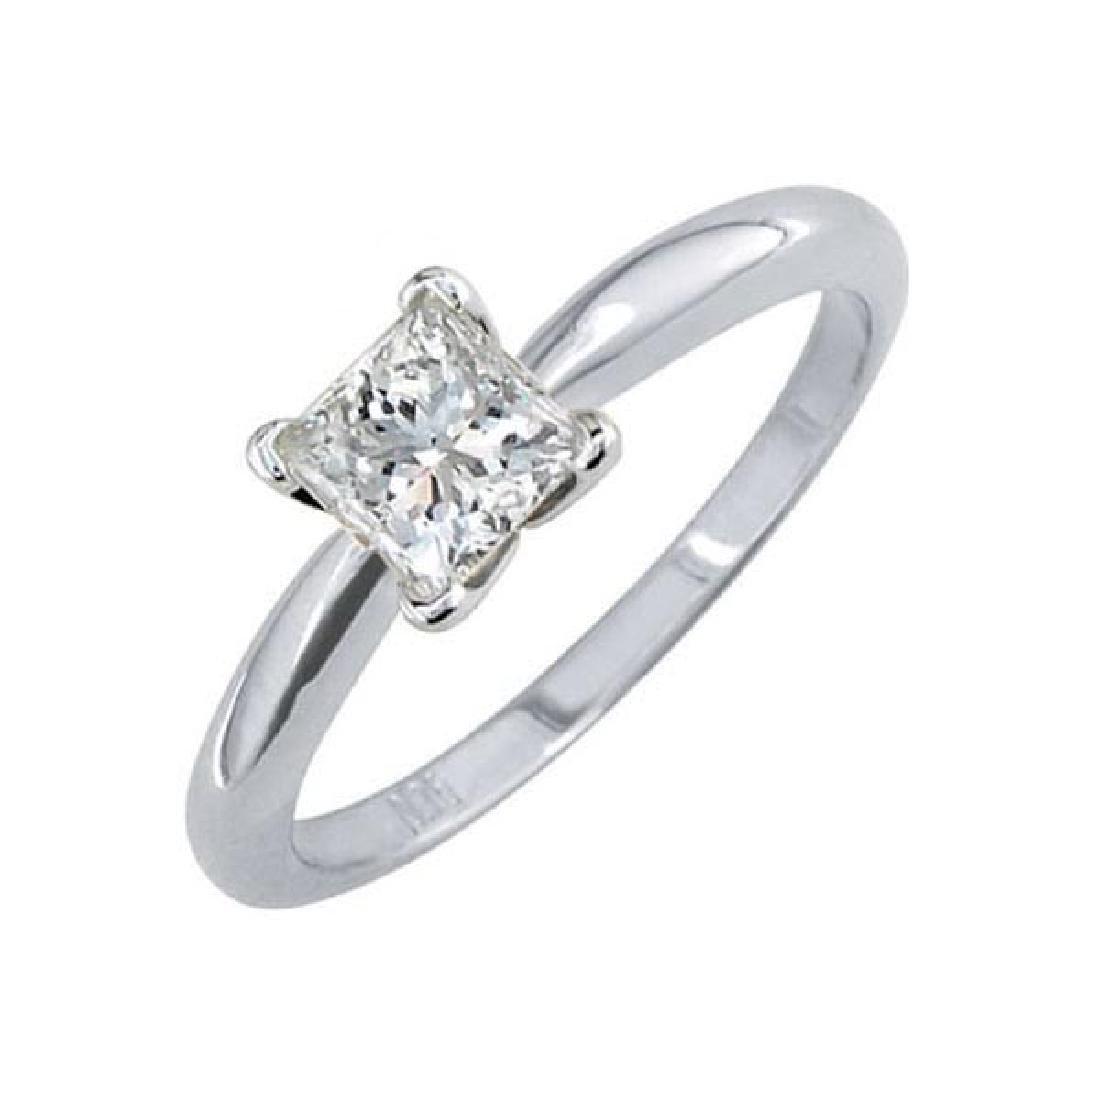 Certified 0.5 CTW Princess Diamond Solitaire 14k Ring G